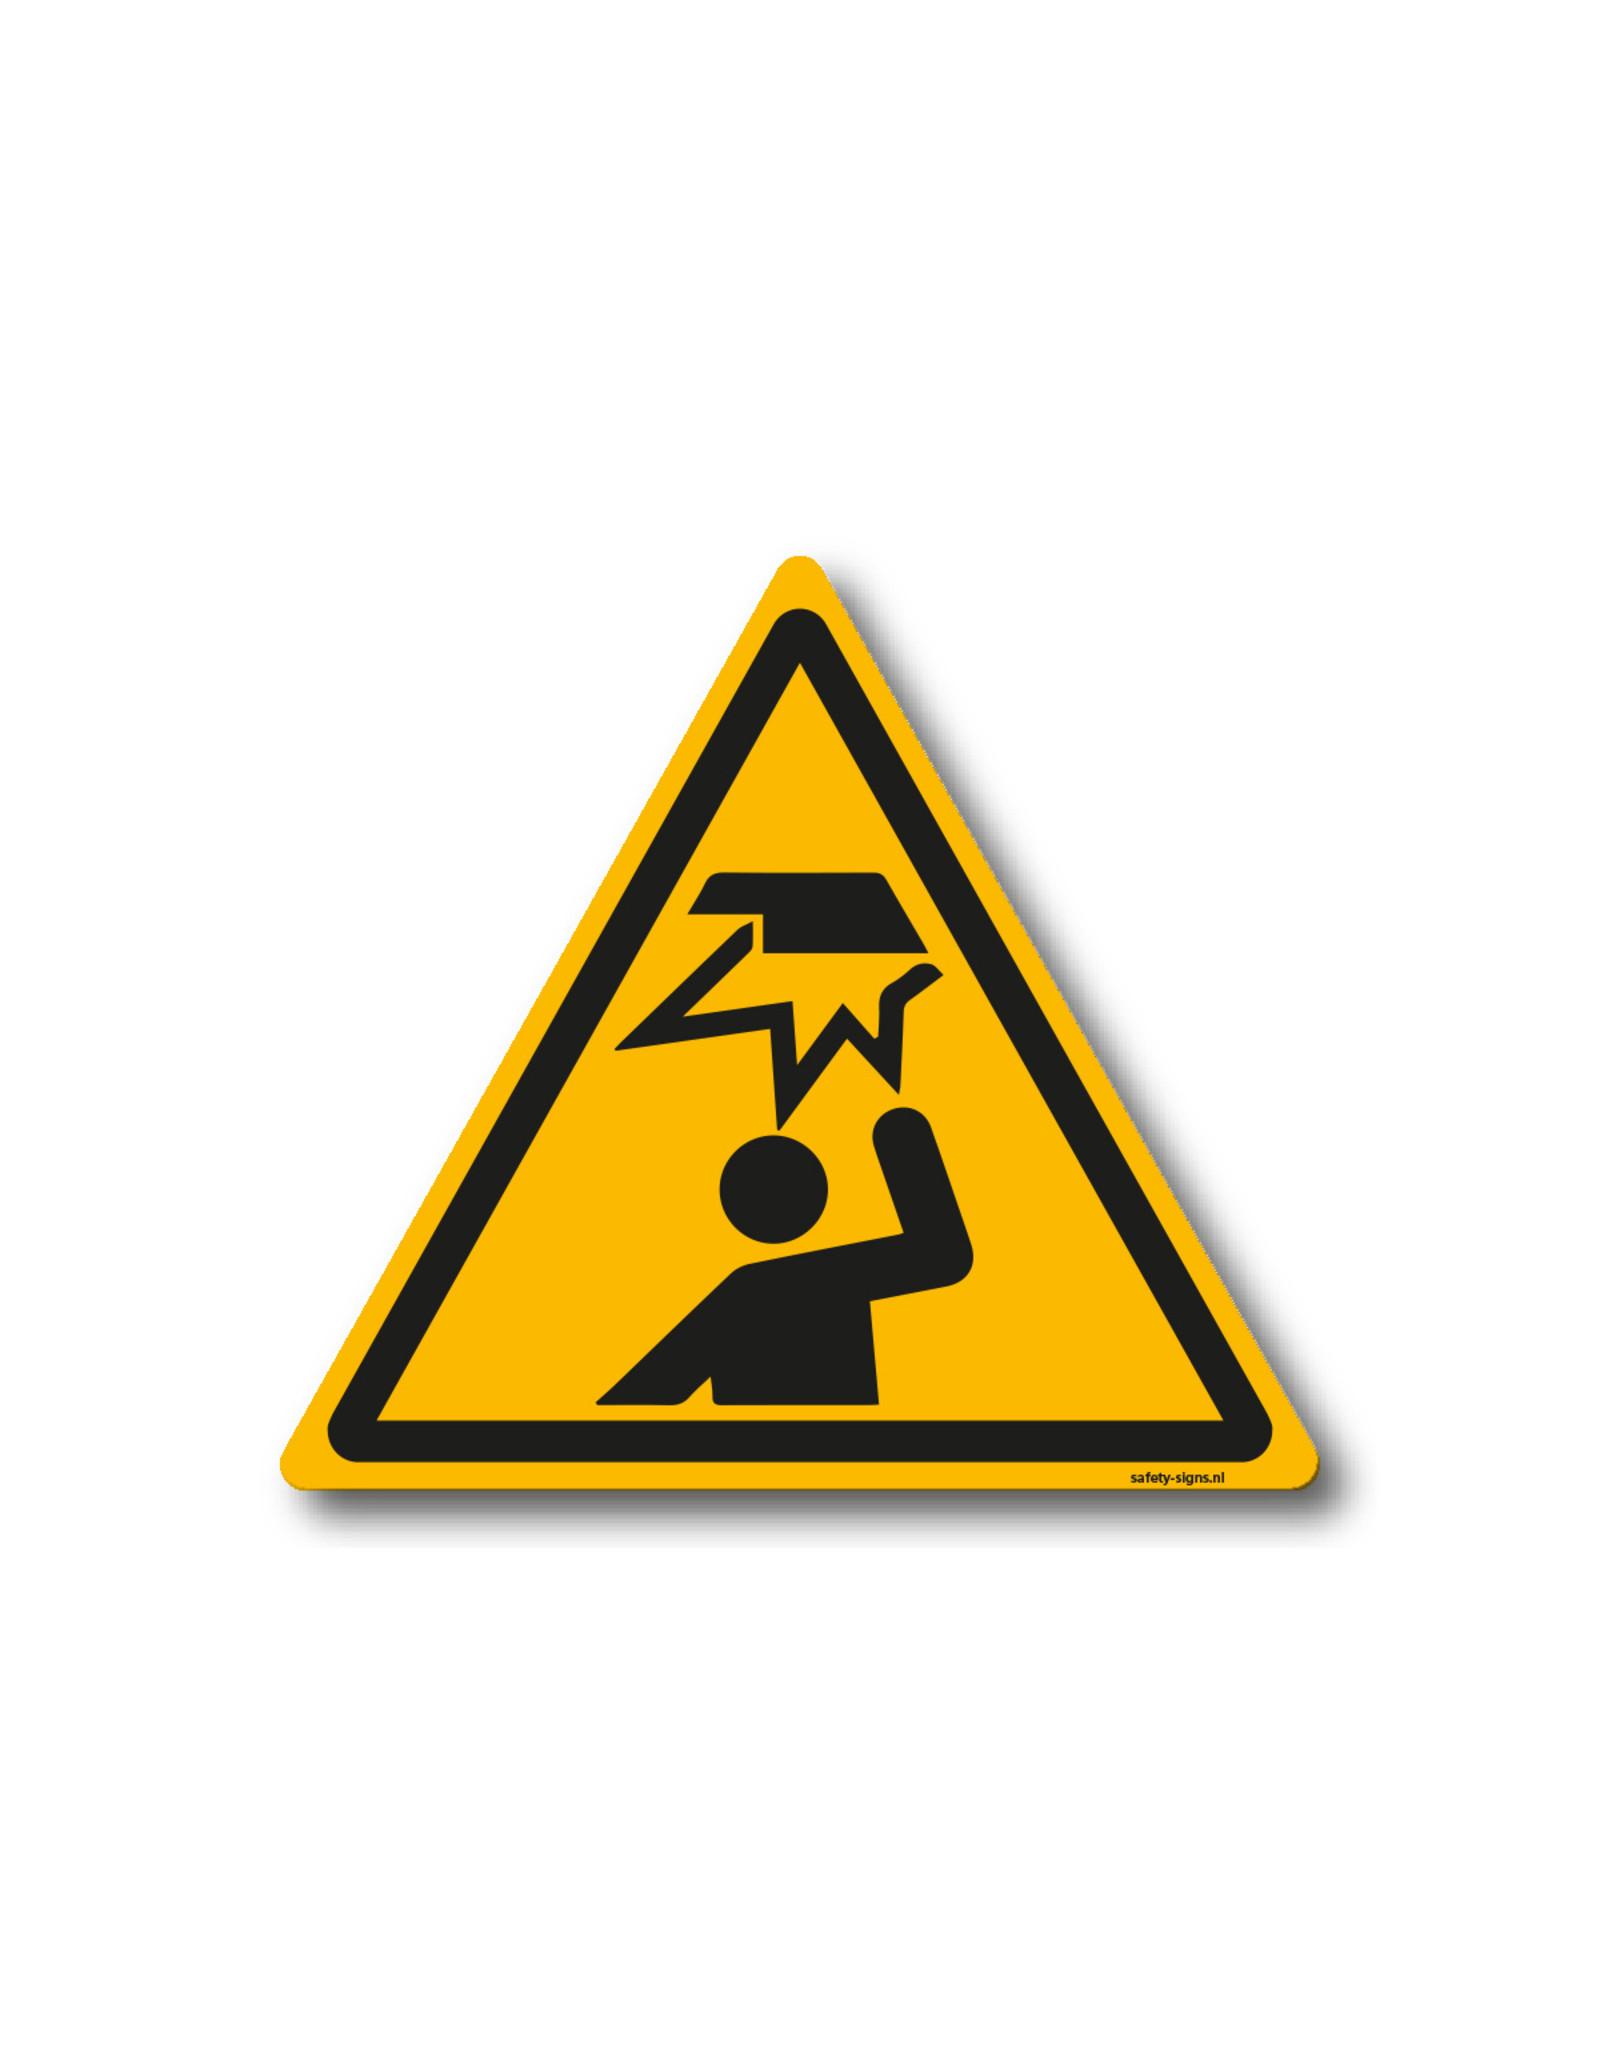 safety-signs.nl Pictogram - W020 - Waarschuwing laaghangende obstakel, stootgevaar - ISO 7010